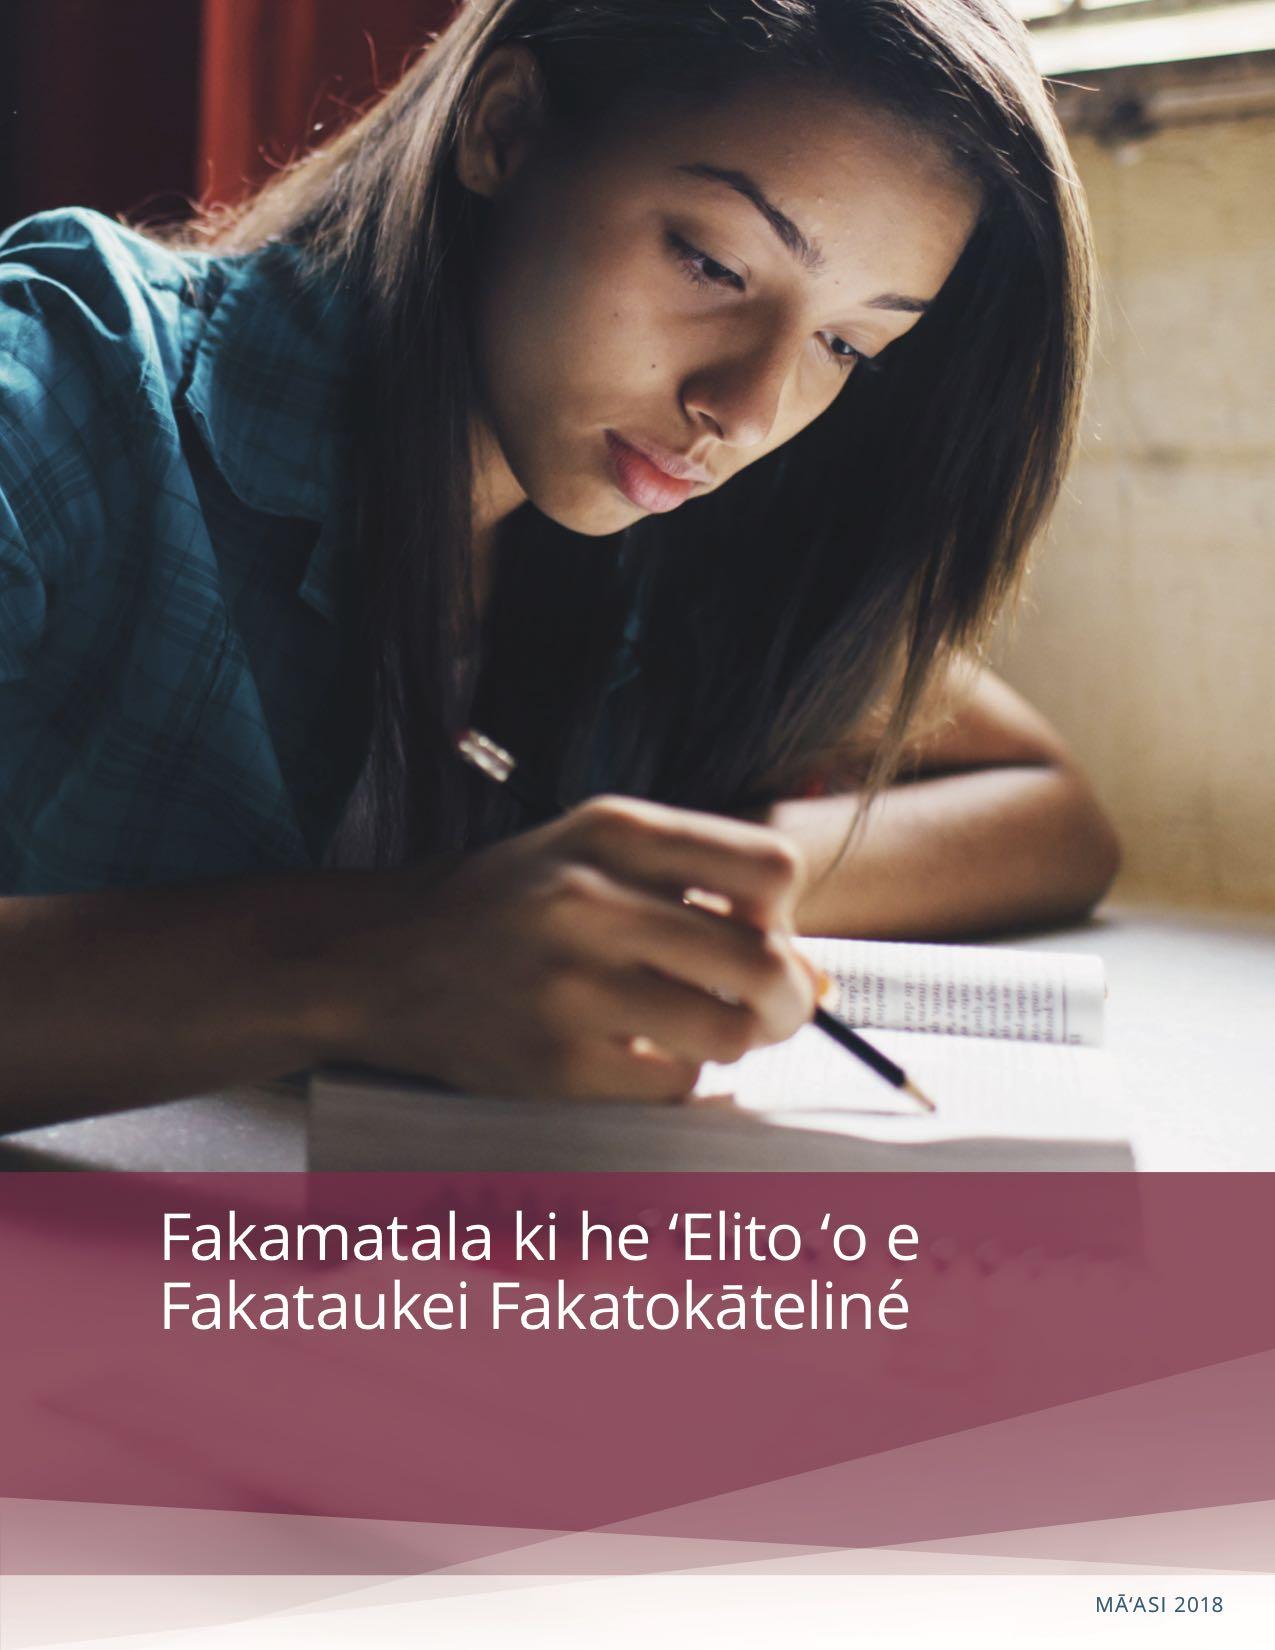 Takafi e Fakamatala ki he ʻElito ʻo e Fakataukei Fakatokāteliné